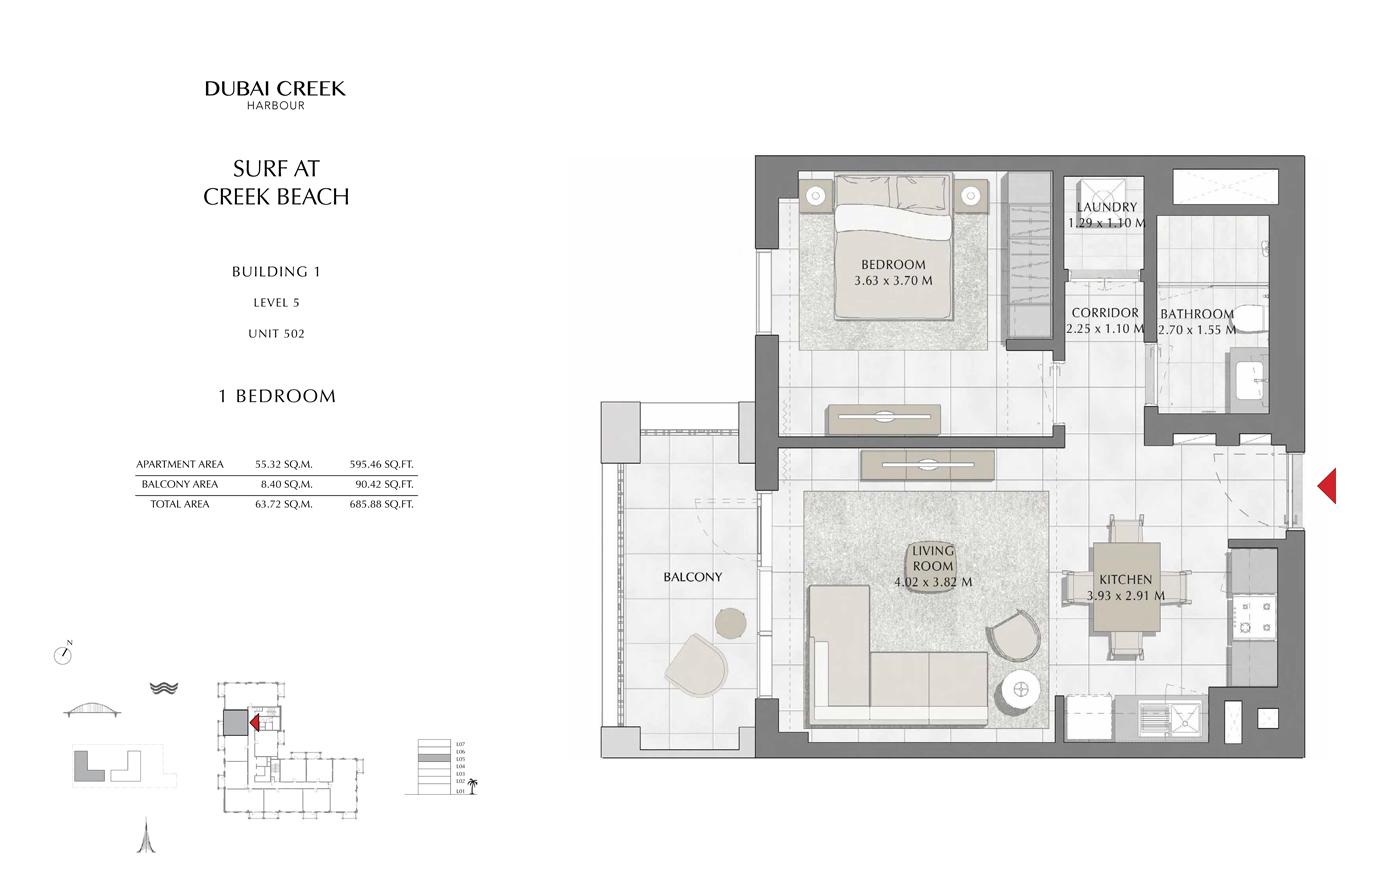 Building 1, 1 Bedroom, Level 5, Size 685 Sq Ft